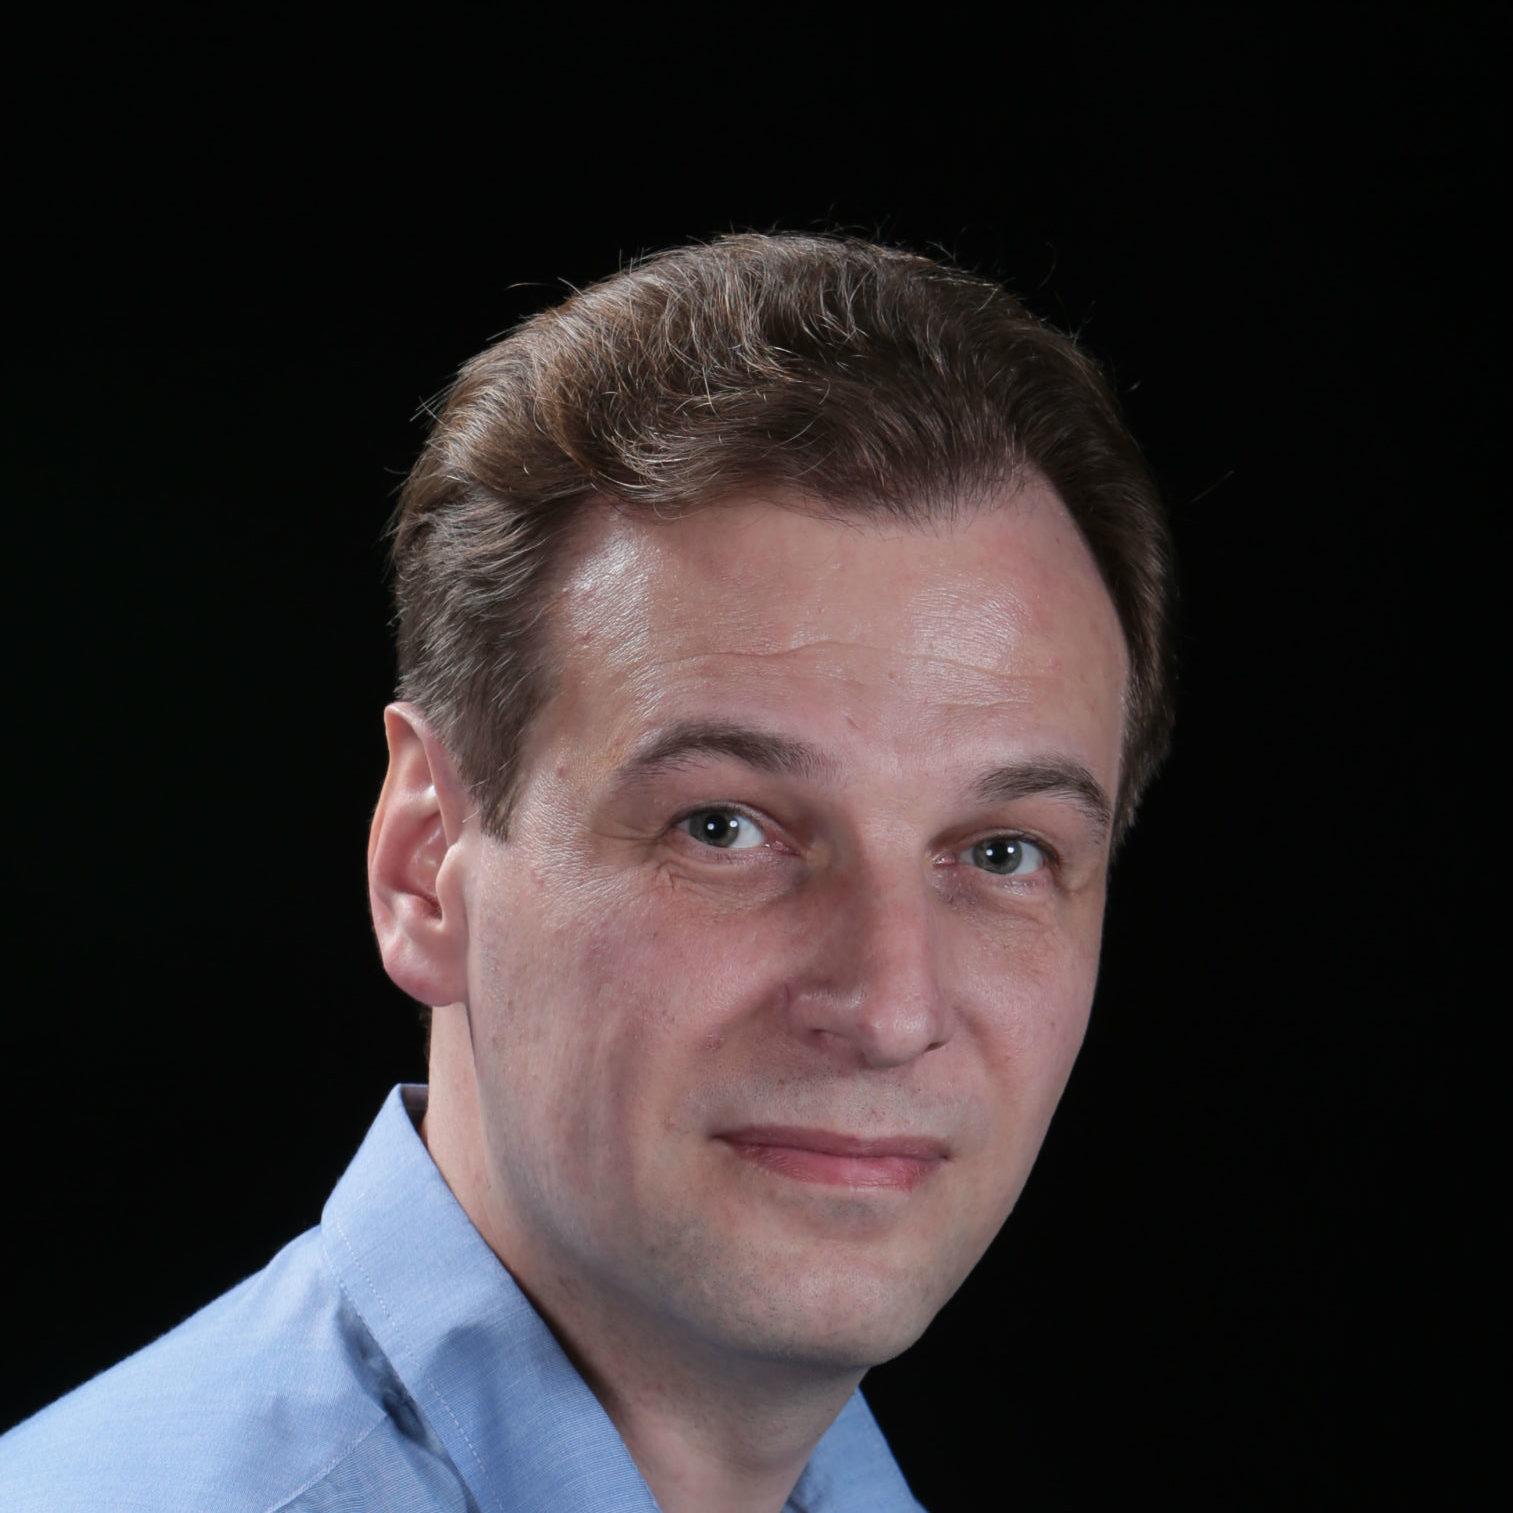 Алексей Поцелуев